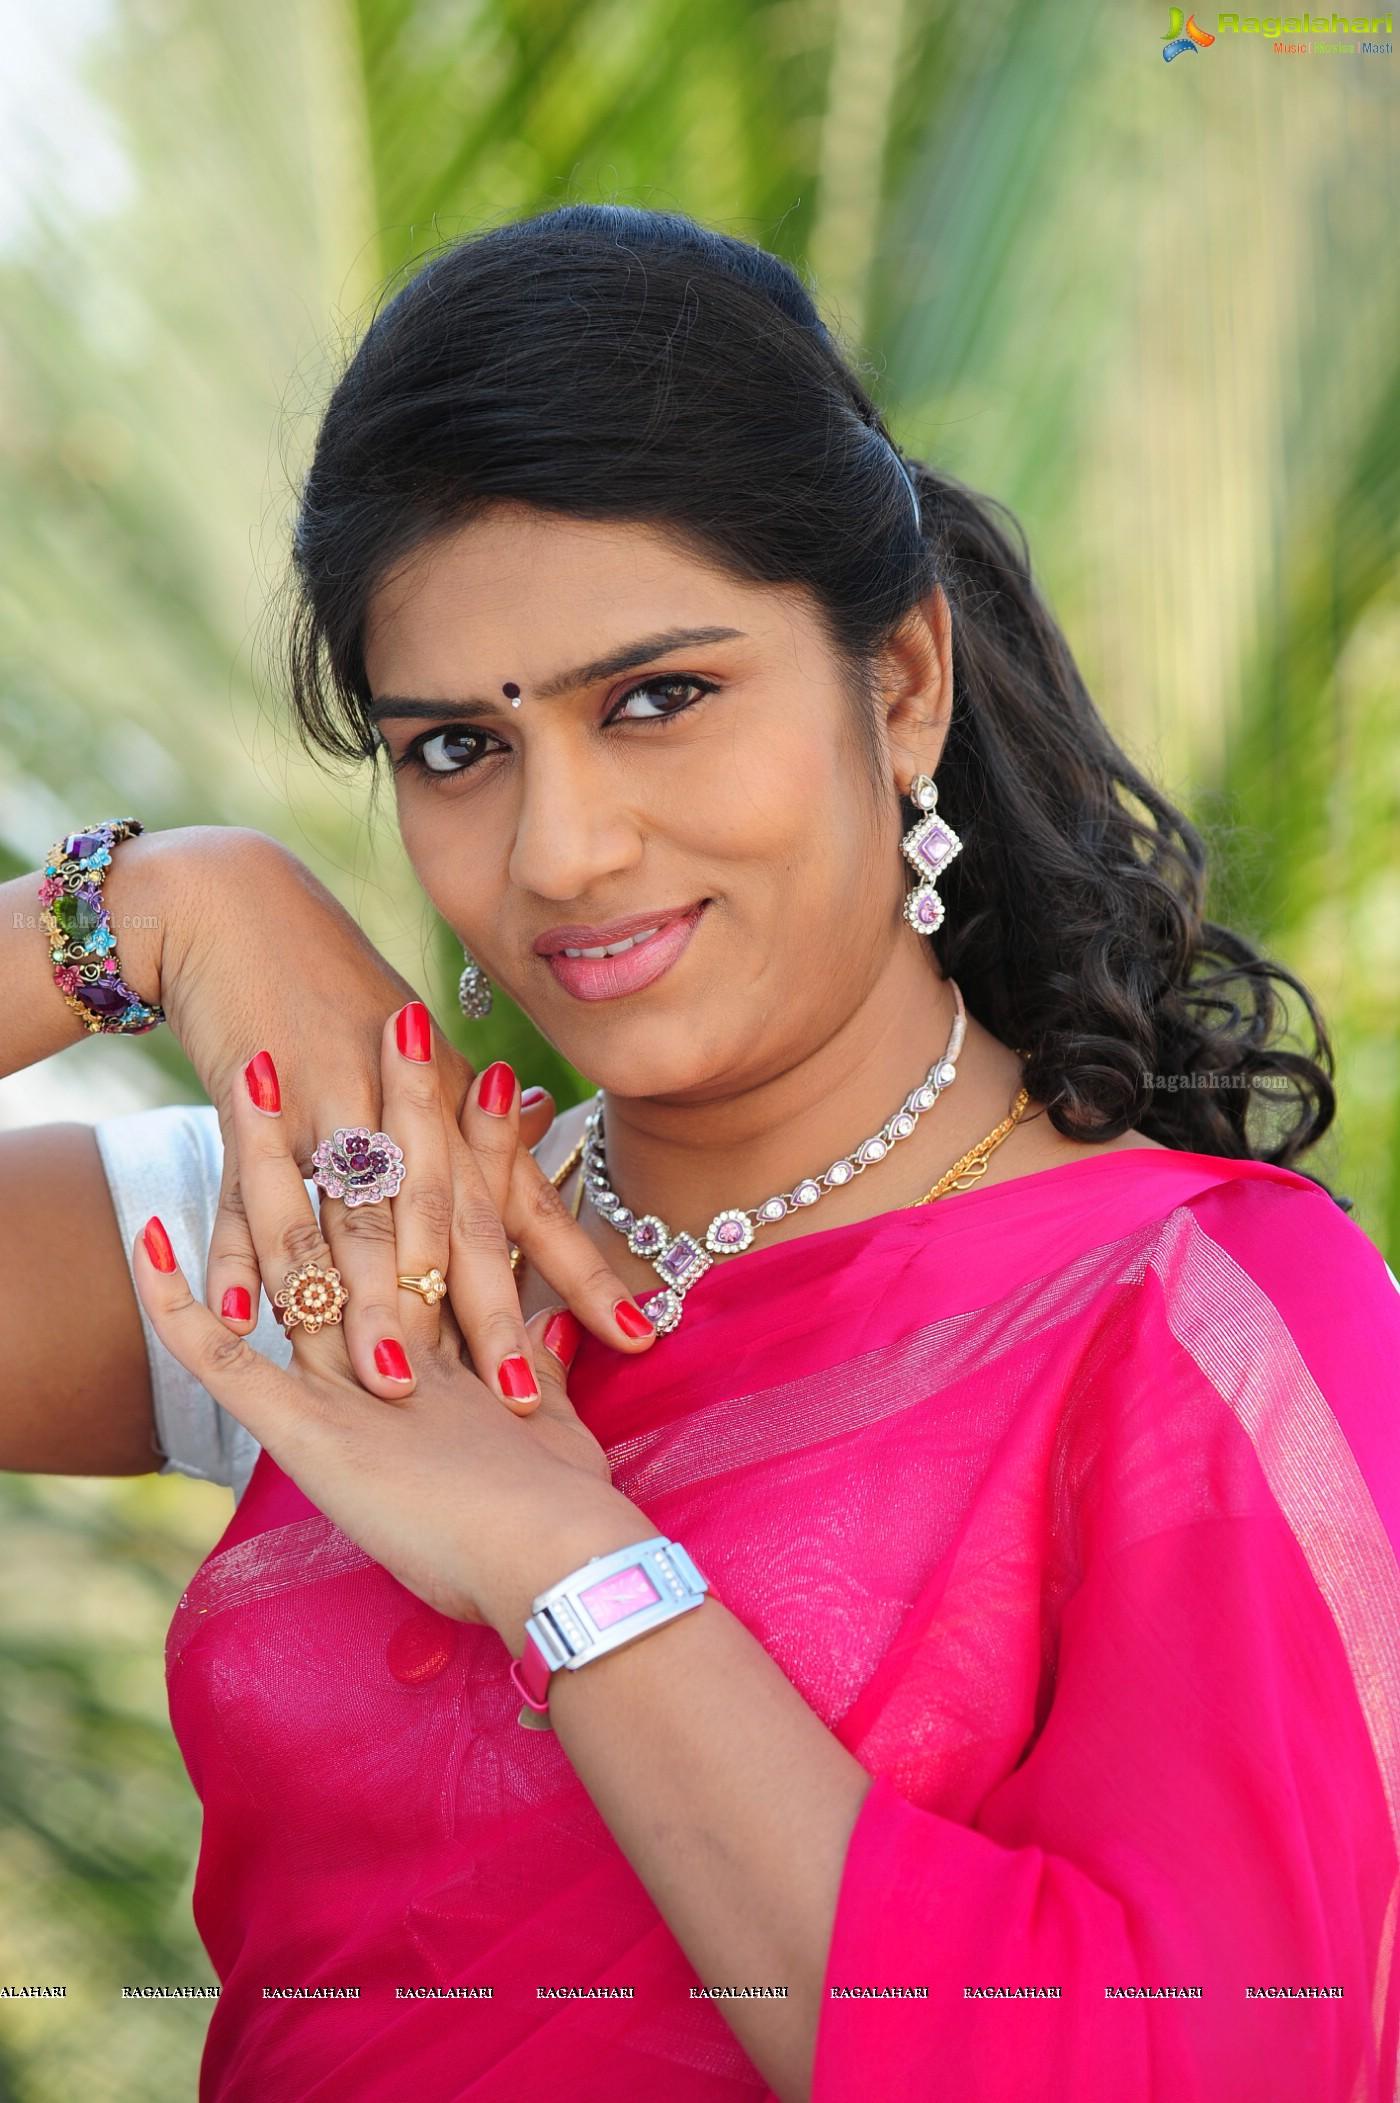 Bhavana posters image 51 tollywood heroines postersimages latest news altavistaventures Gallery